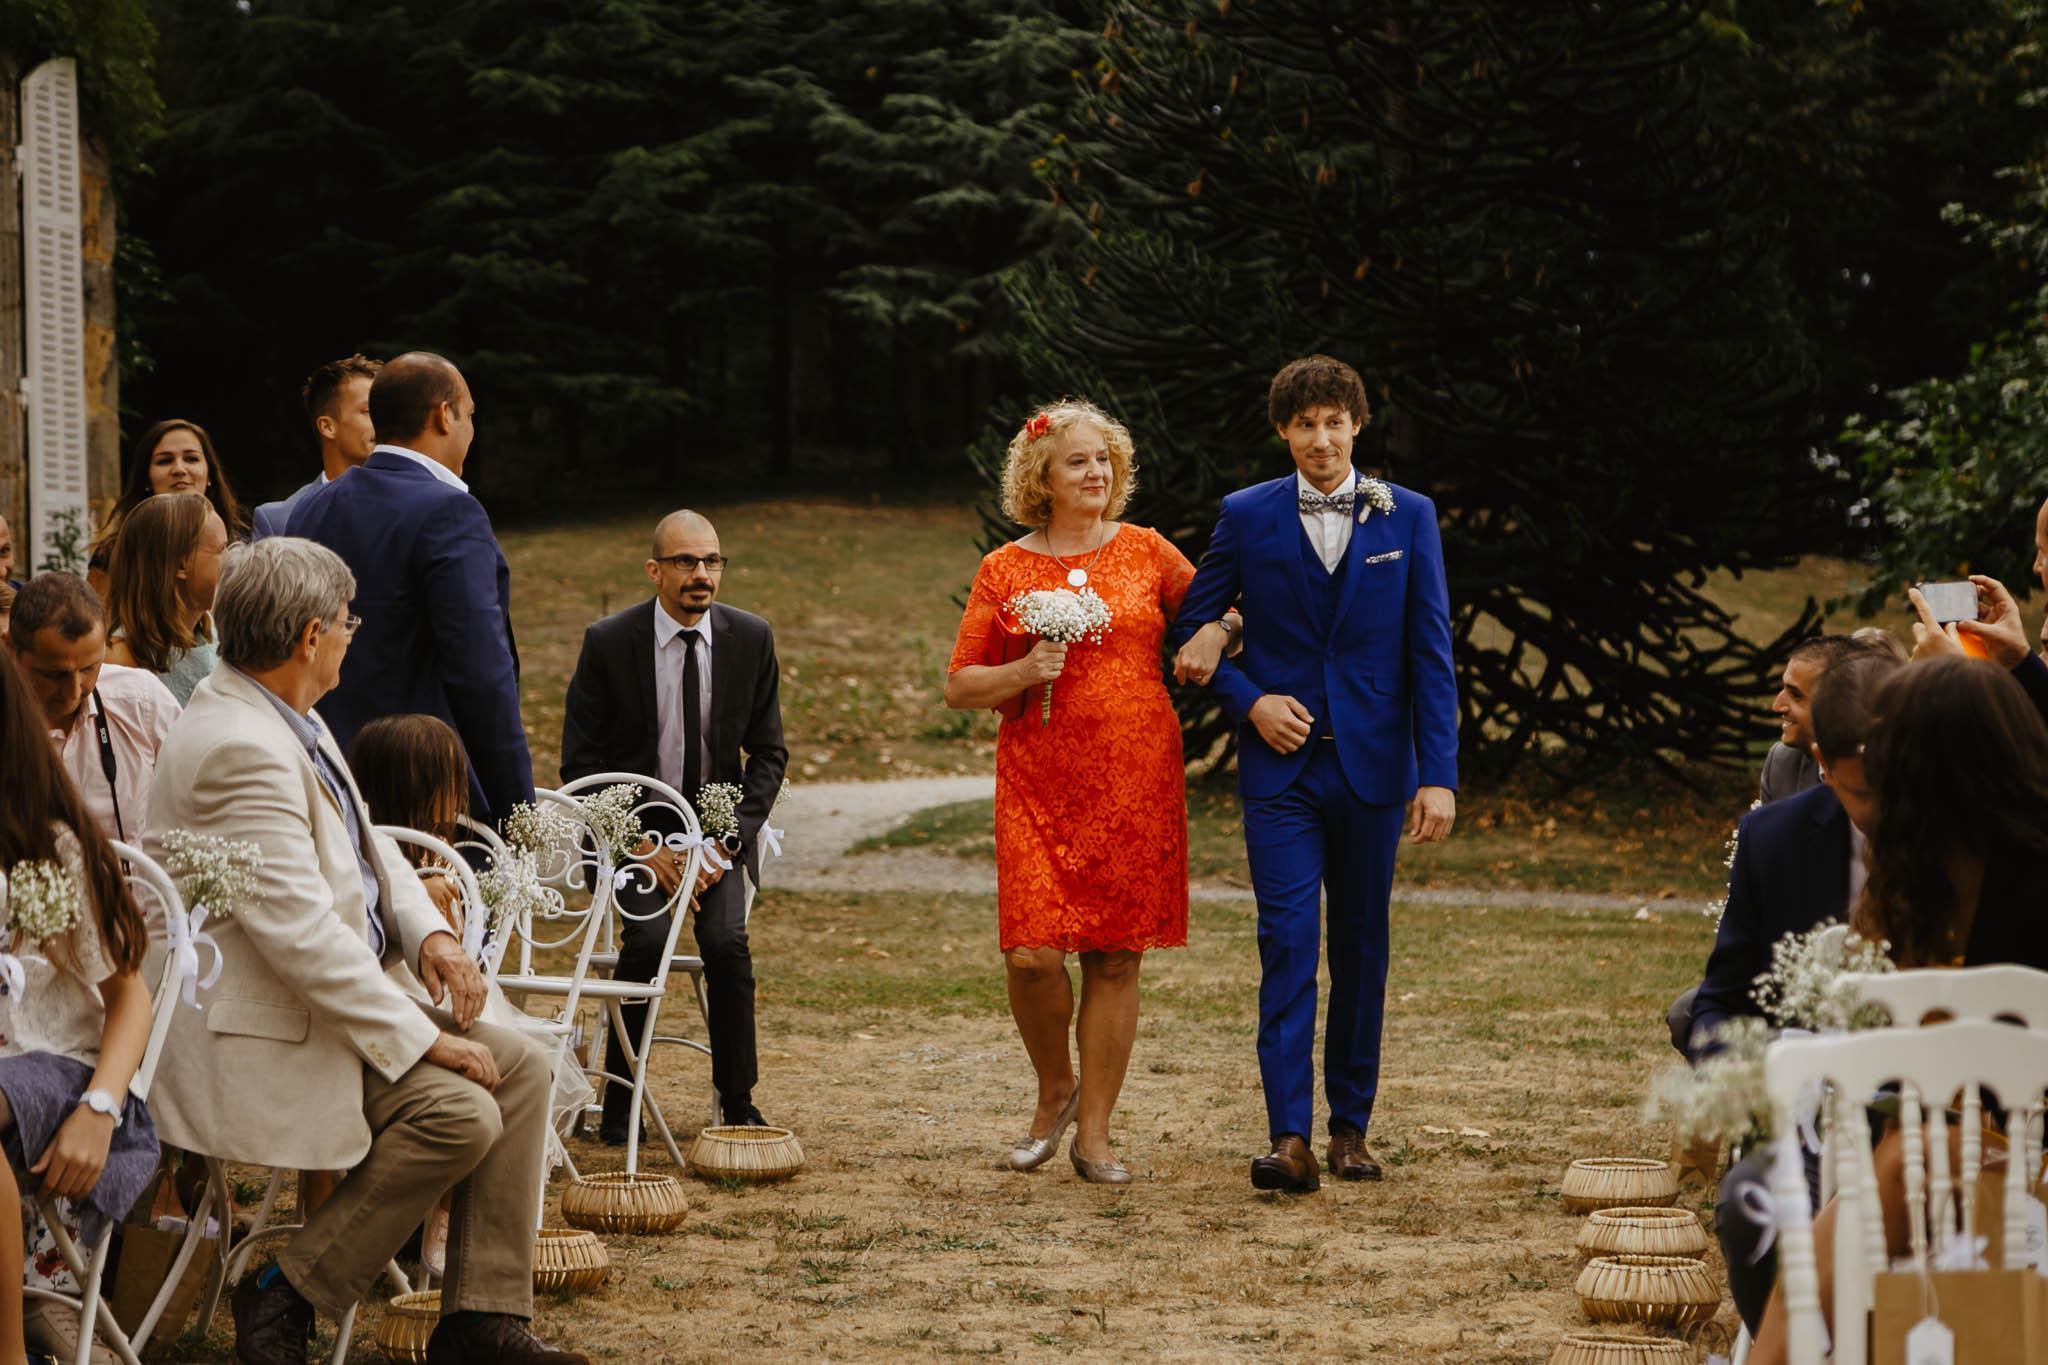 mariage-chateau-gaudras-ingold-26.jpg